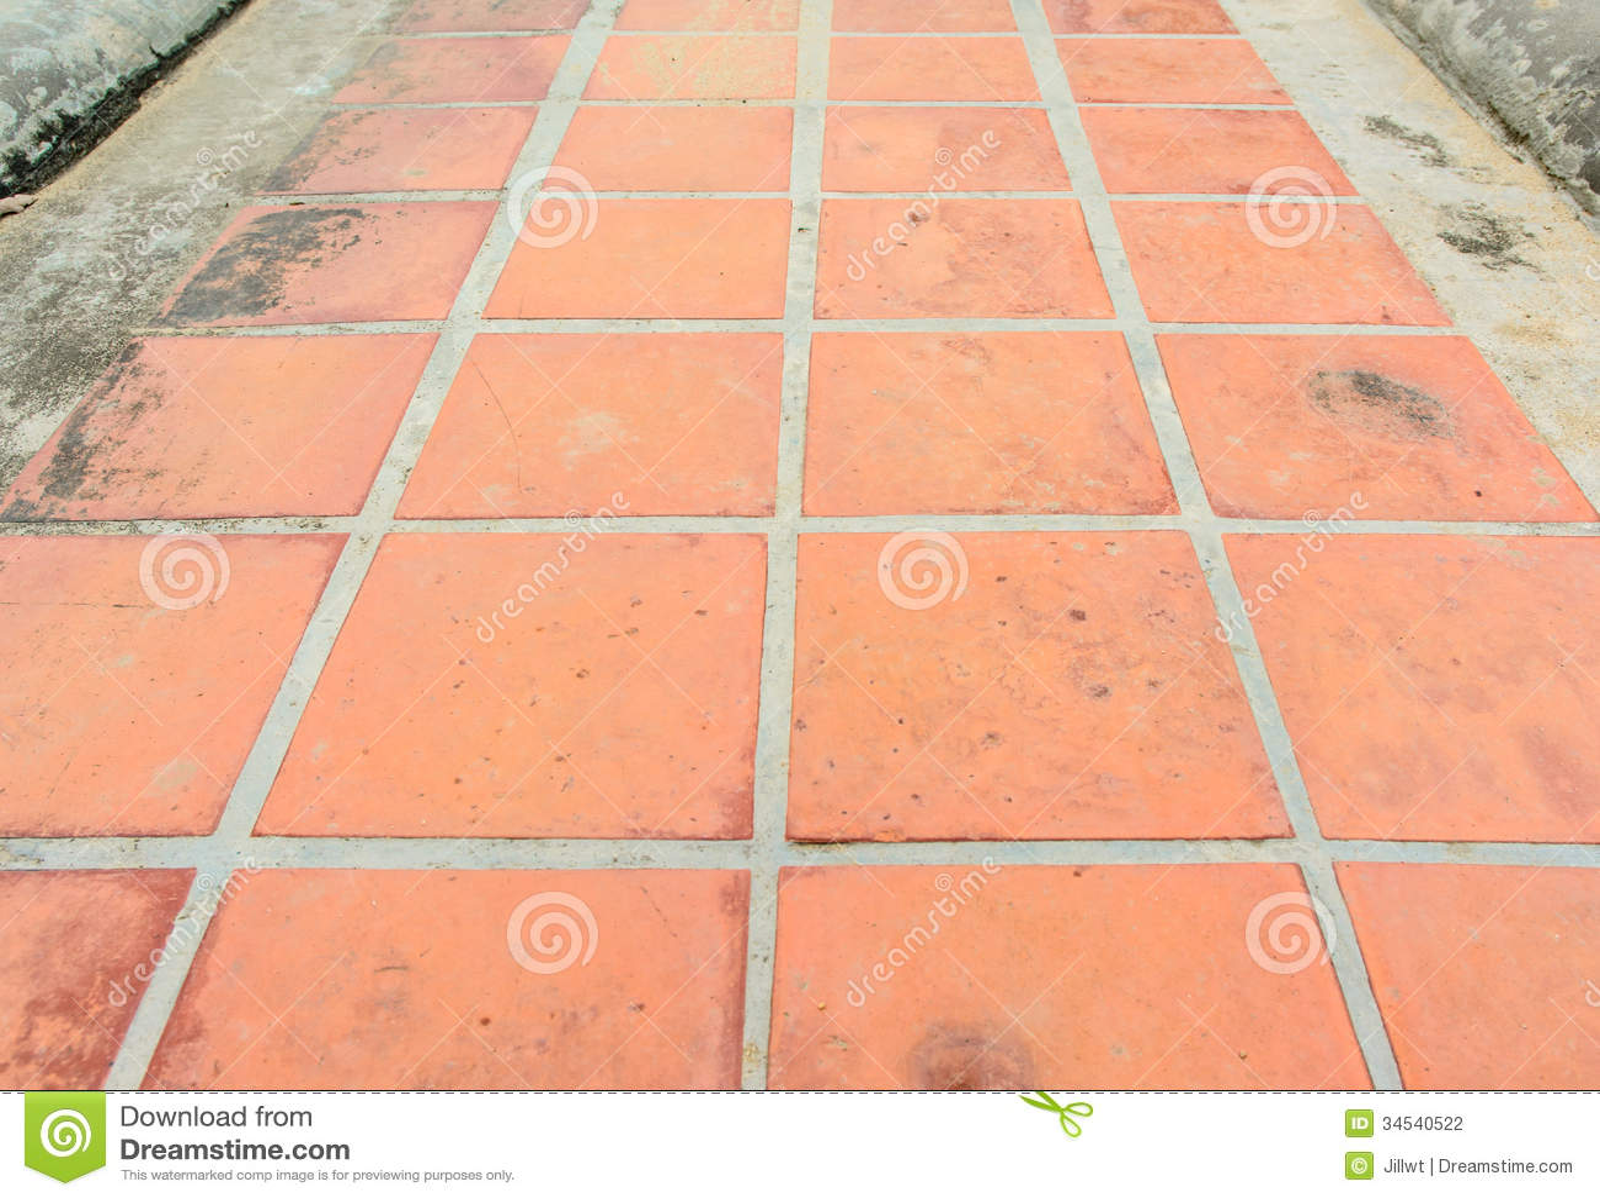 Grunge tile block stock photography image 34540522 for Concrete block floor